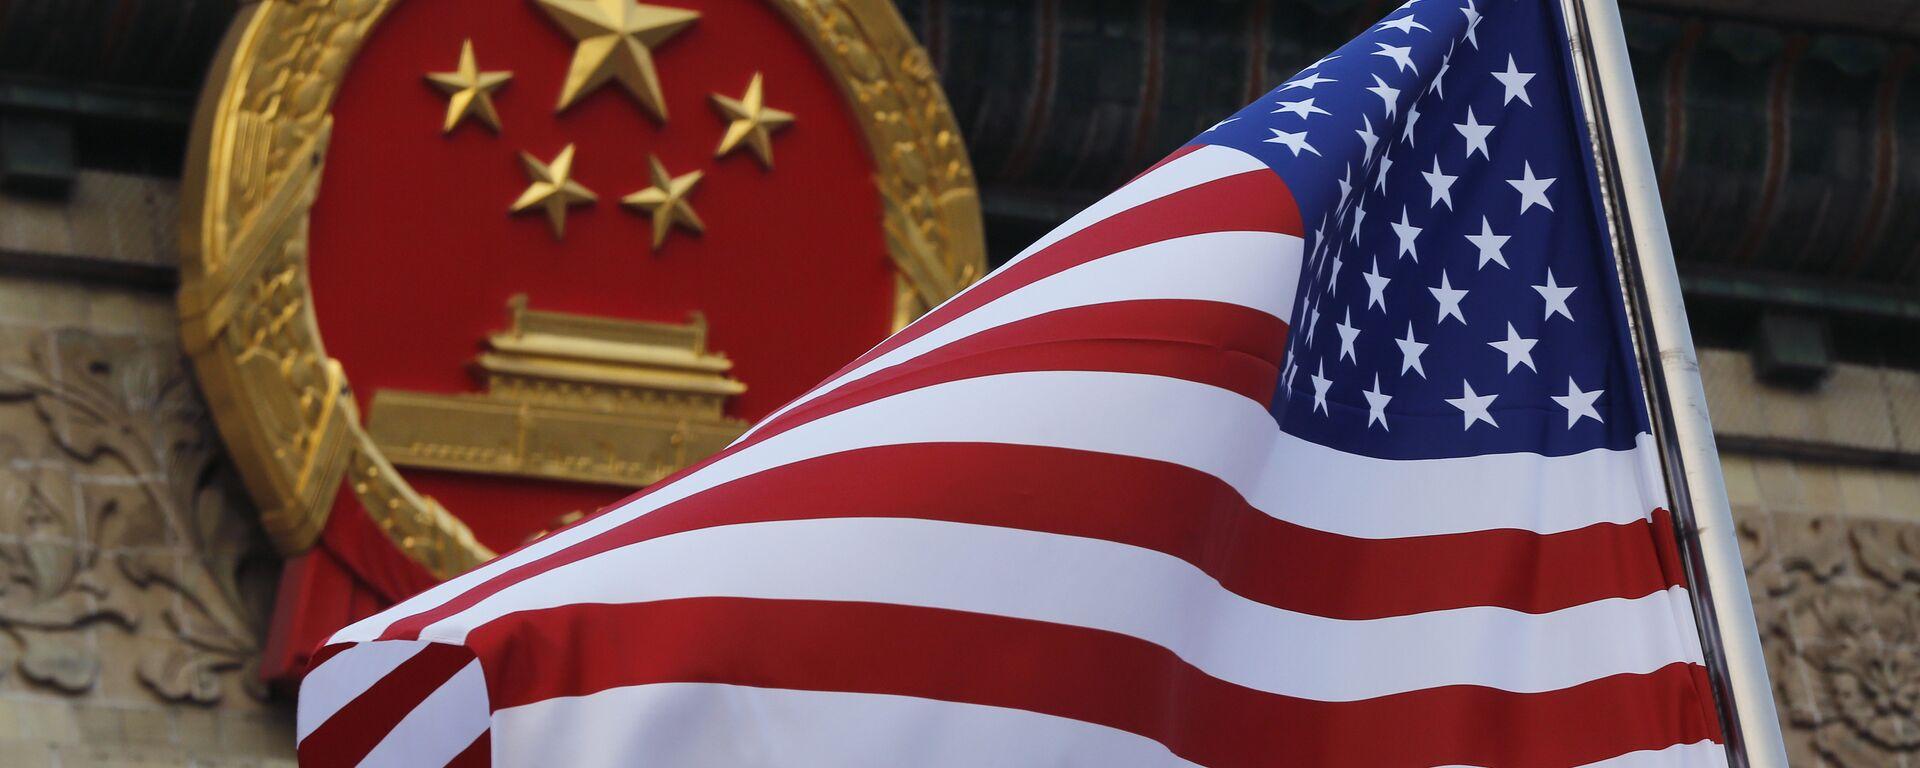 La bandera de EEUU y el emblema de China  - Sputnik Mundo, 1920, 09.03.2021